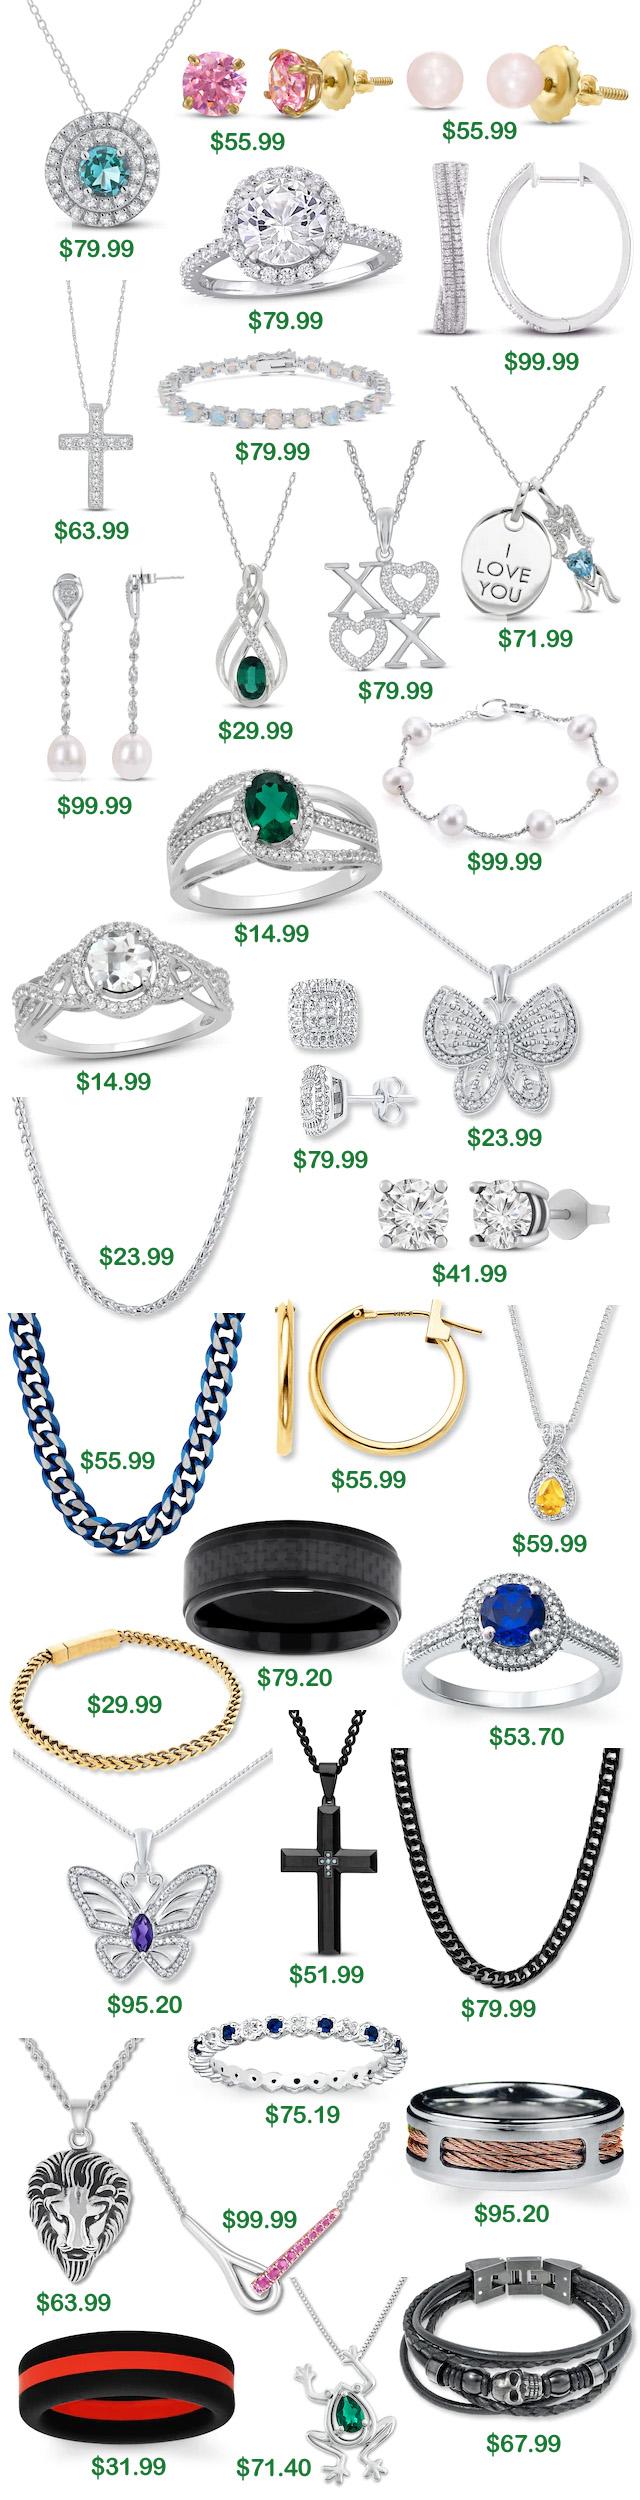 Black Friday 2020 Jewelry Deals Under 100 Dollars